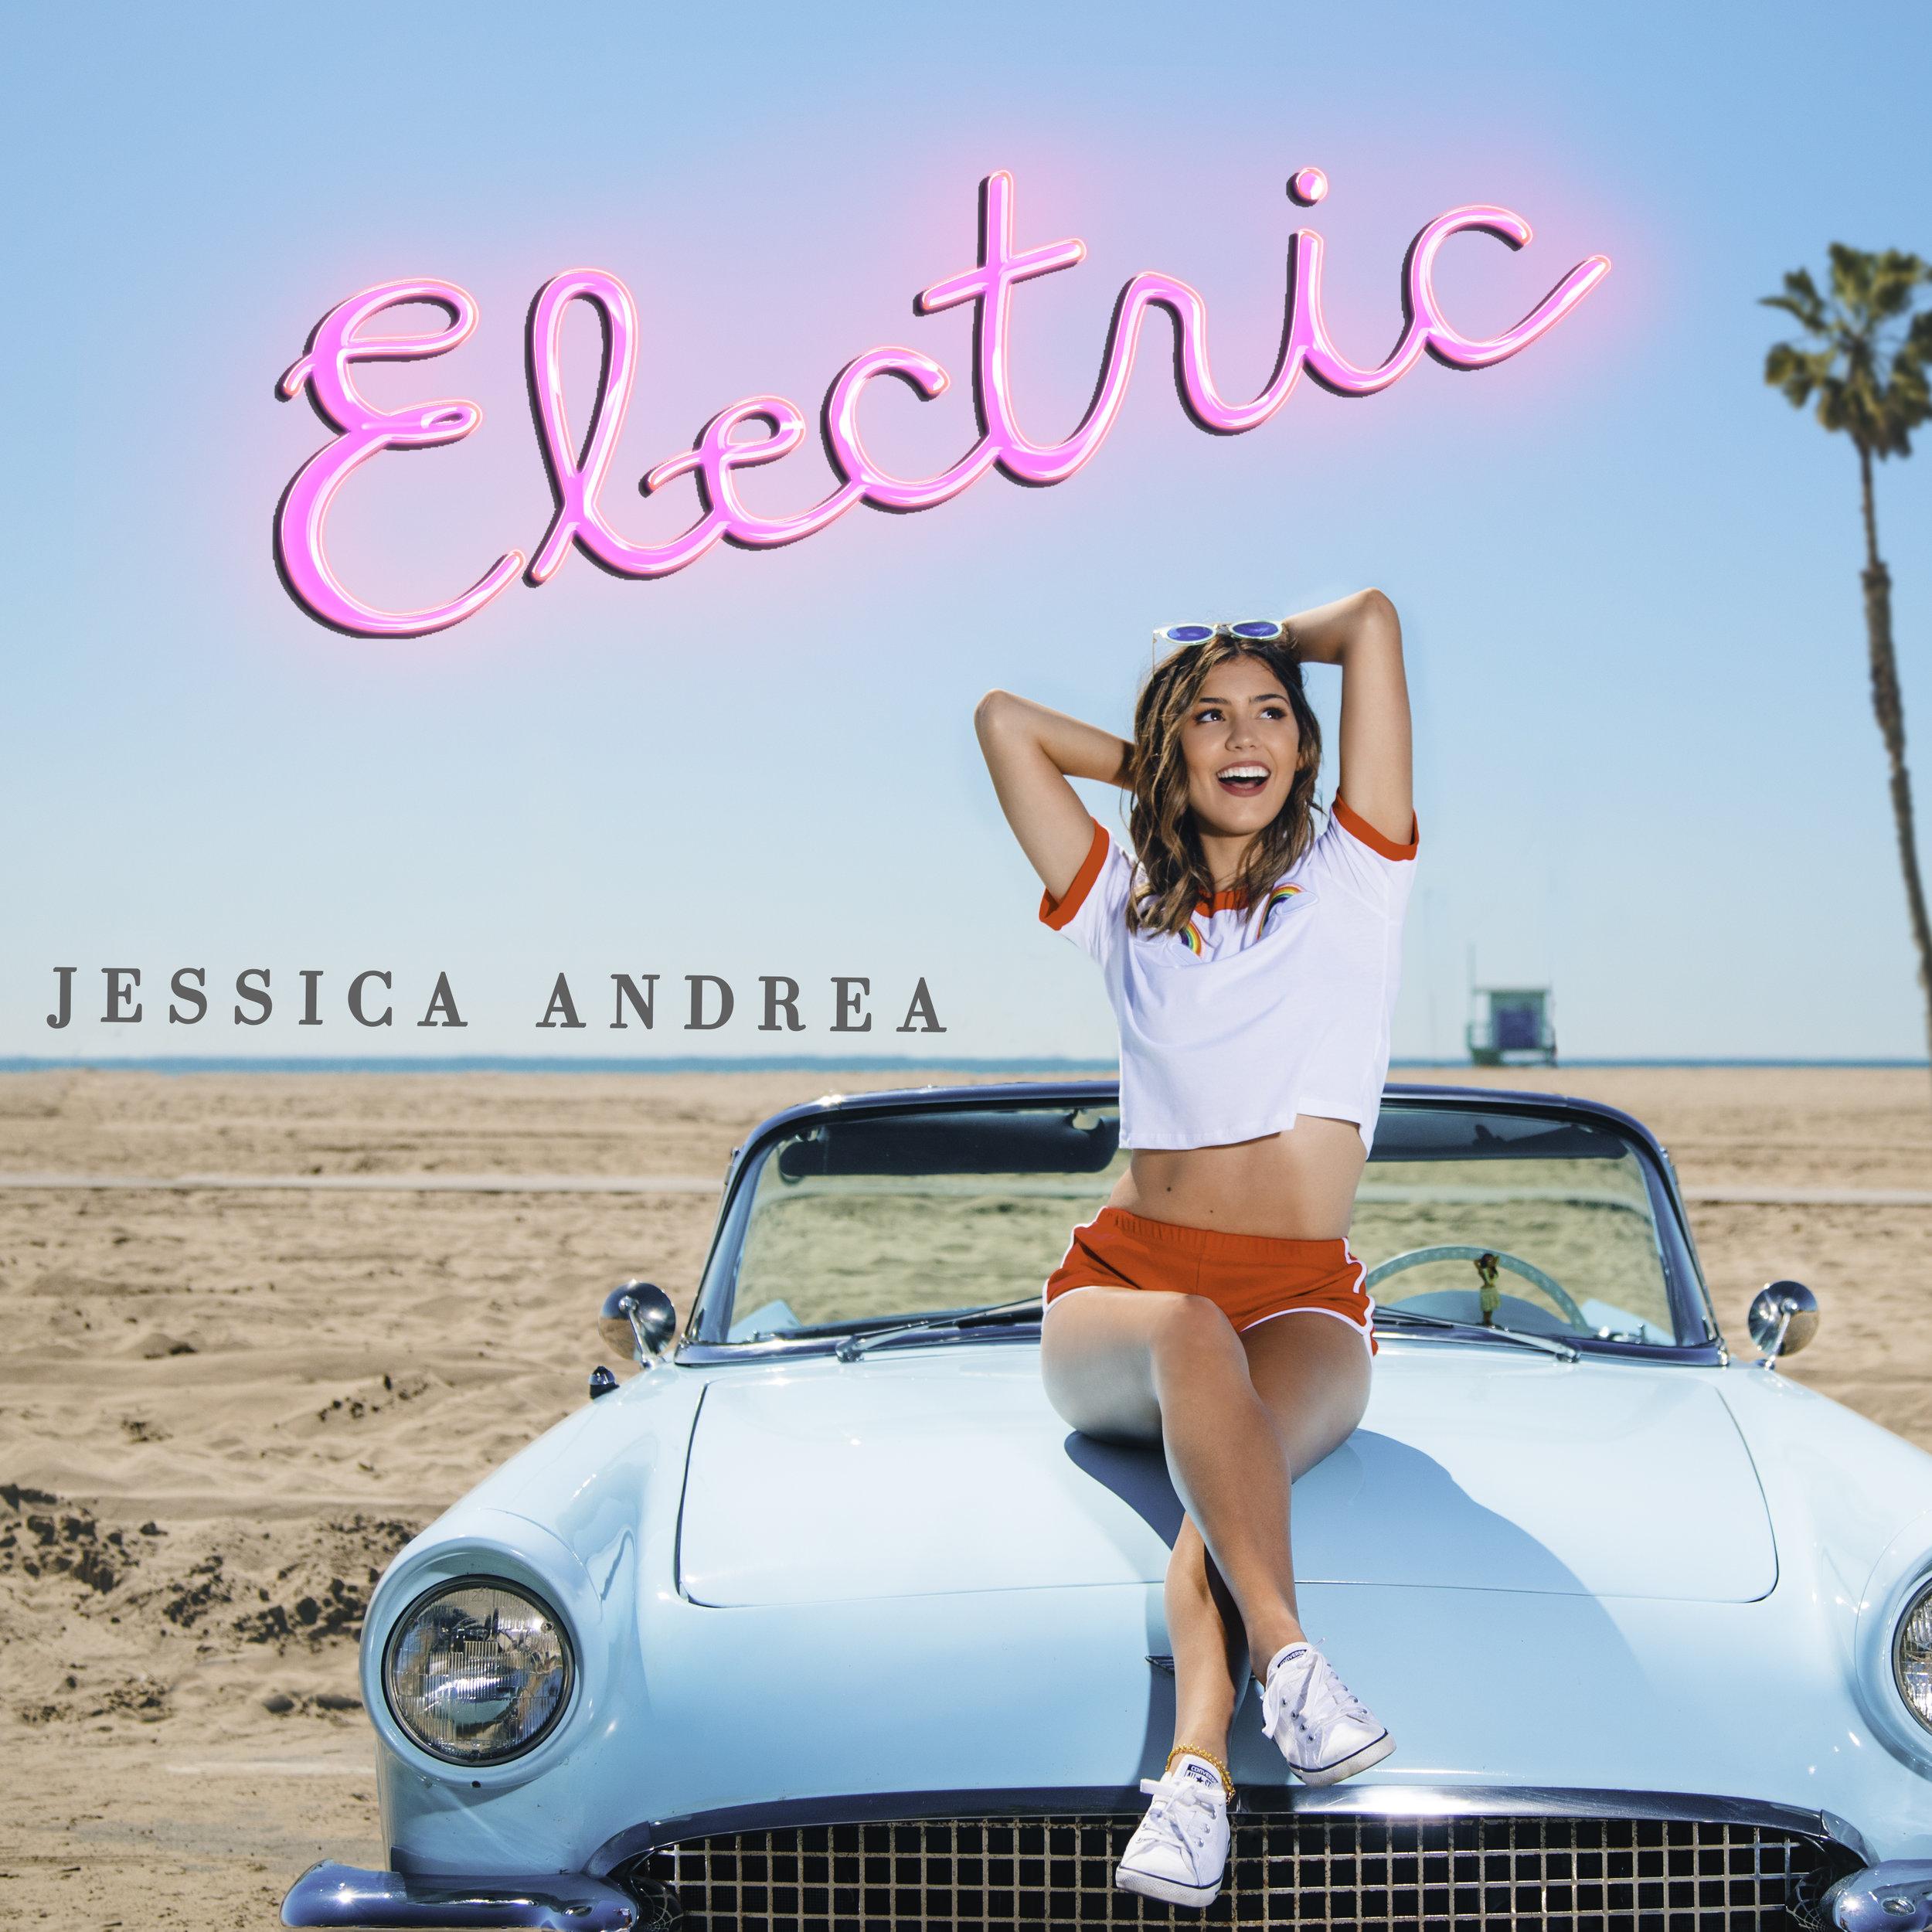 JessicaAndrea_Electric_cover_FULL.jpg